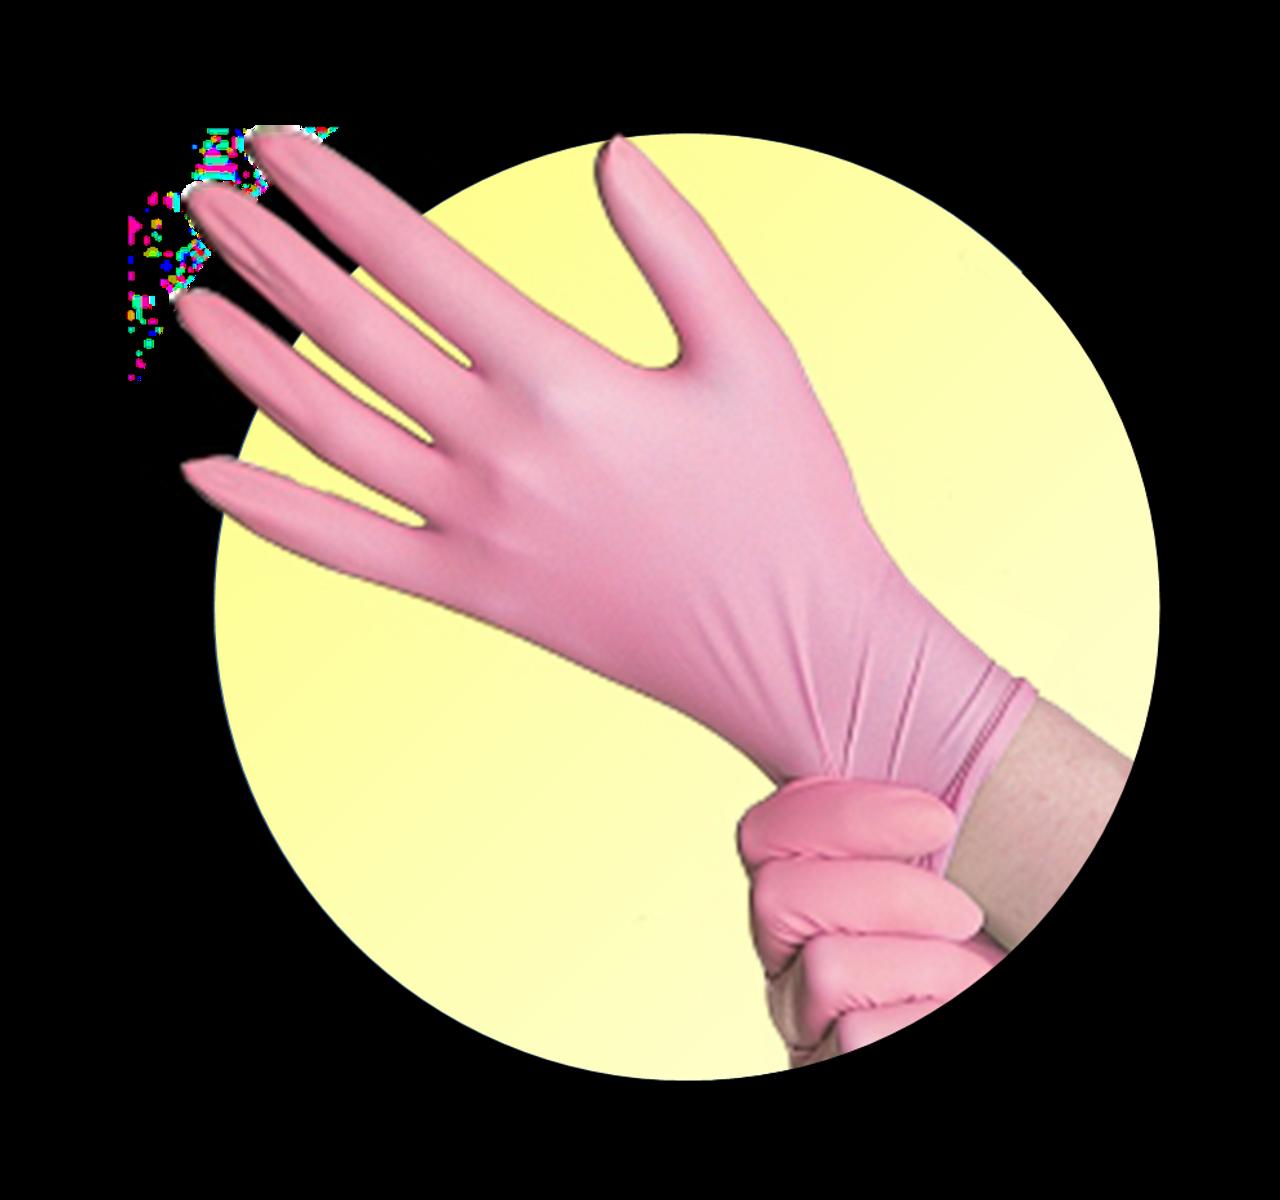 Breast Cancer Awareness Pink Nitrile Exam Gloves